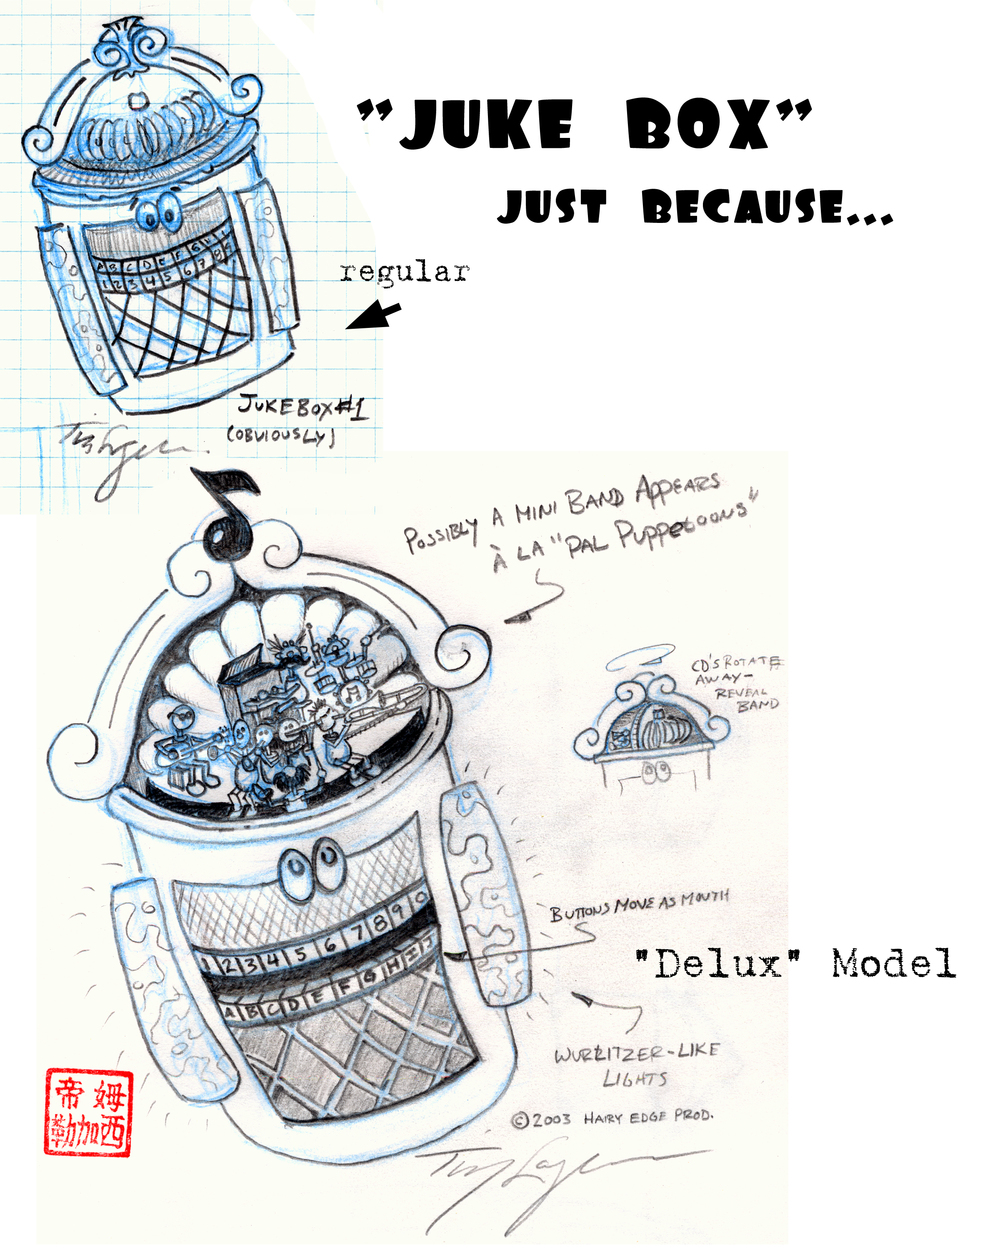 Juke Box concept design.